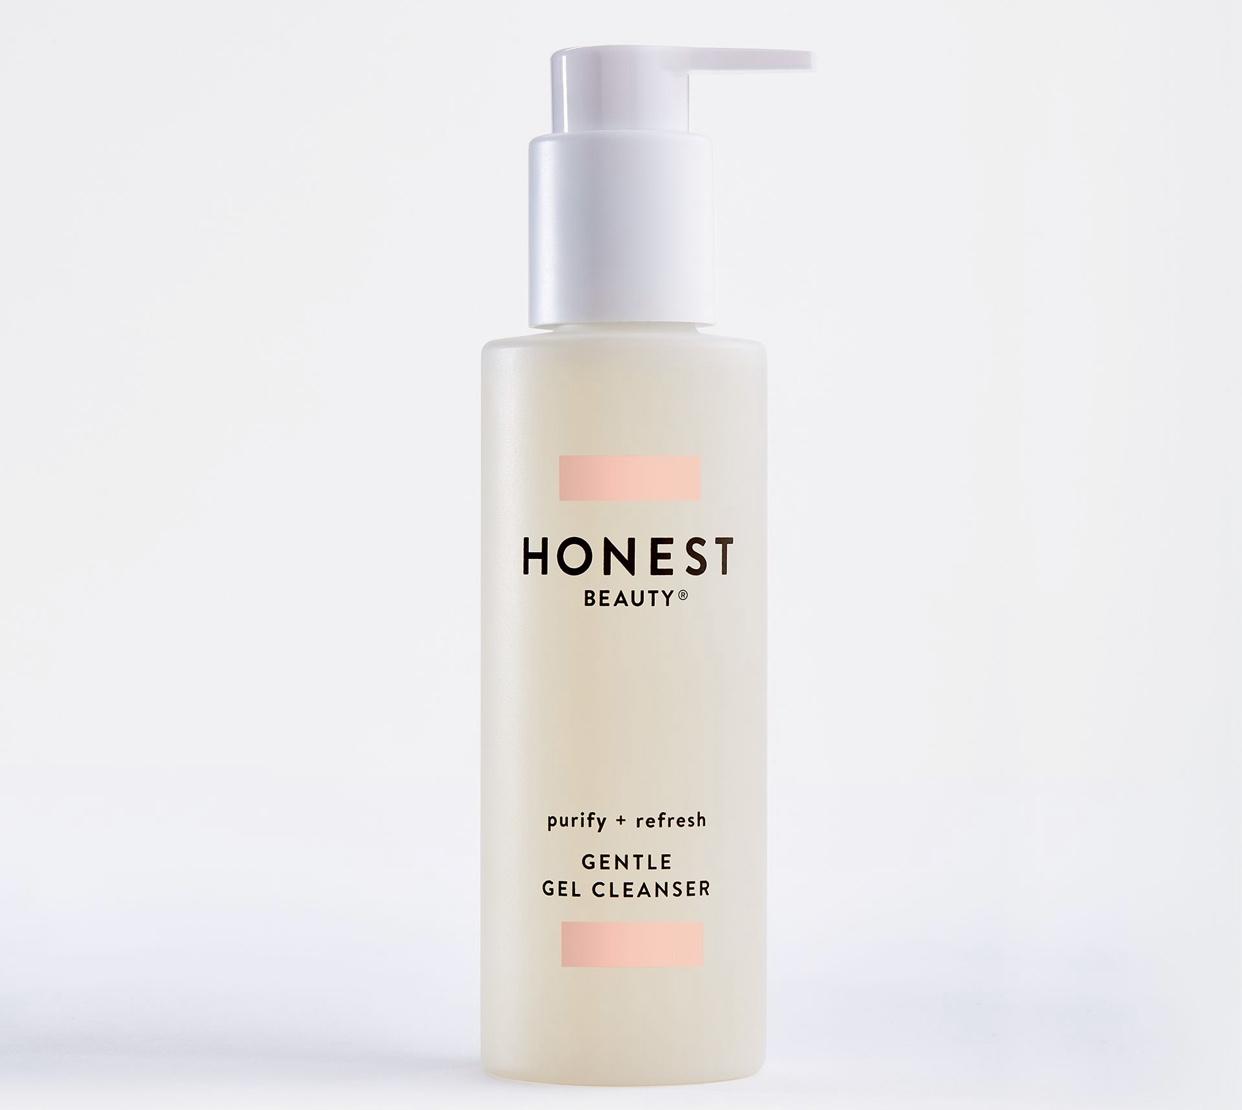 Honest Beauty Gentle Gel Cleanser